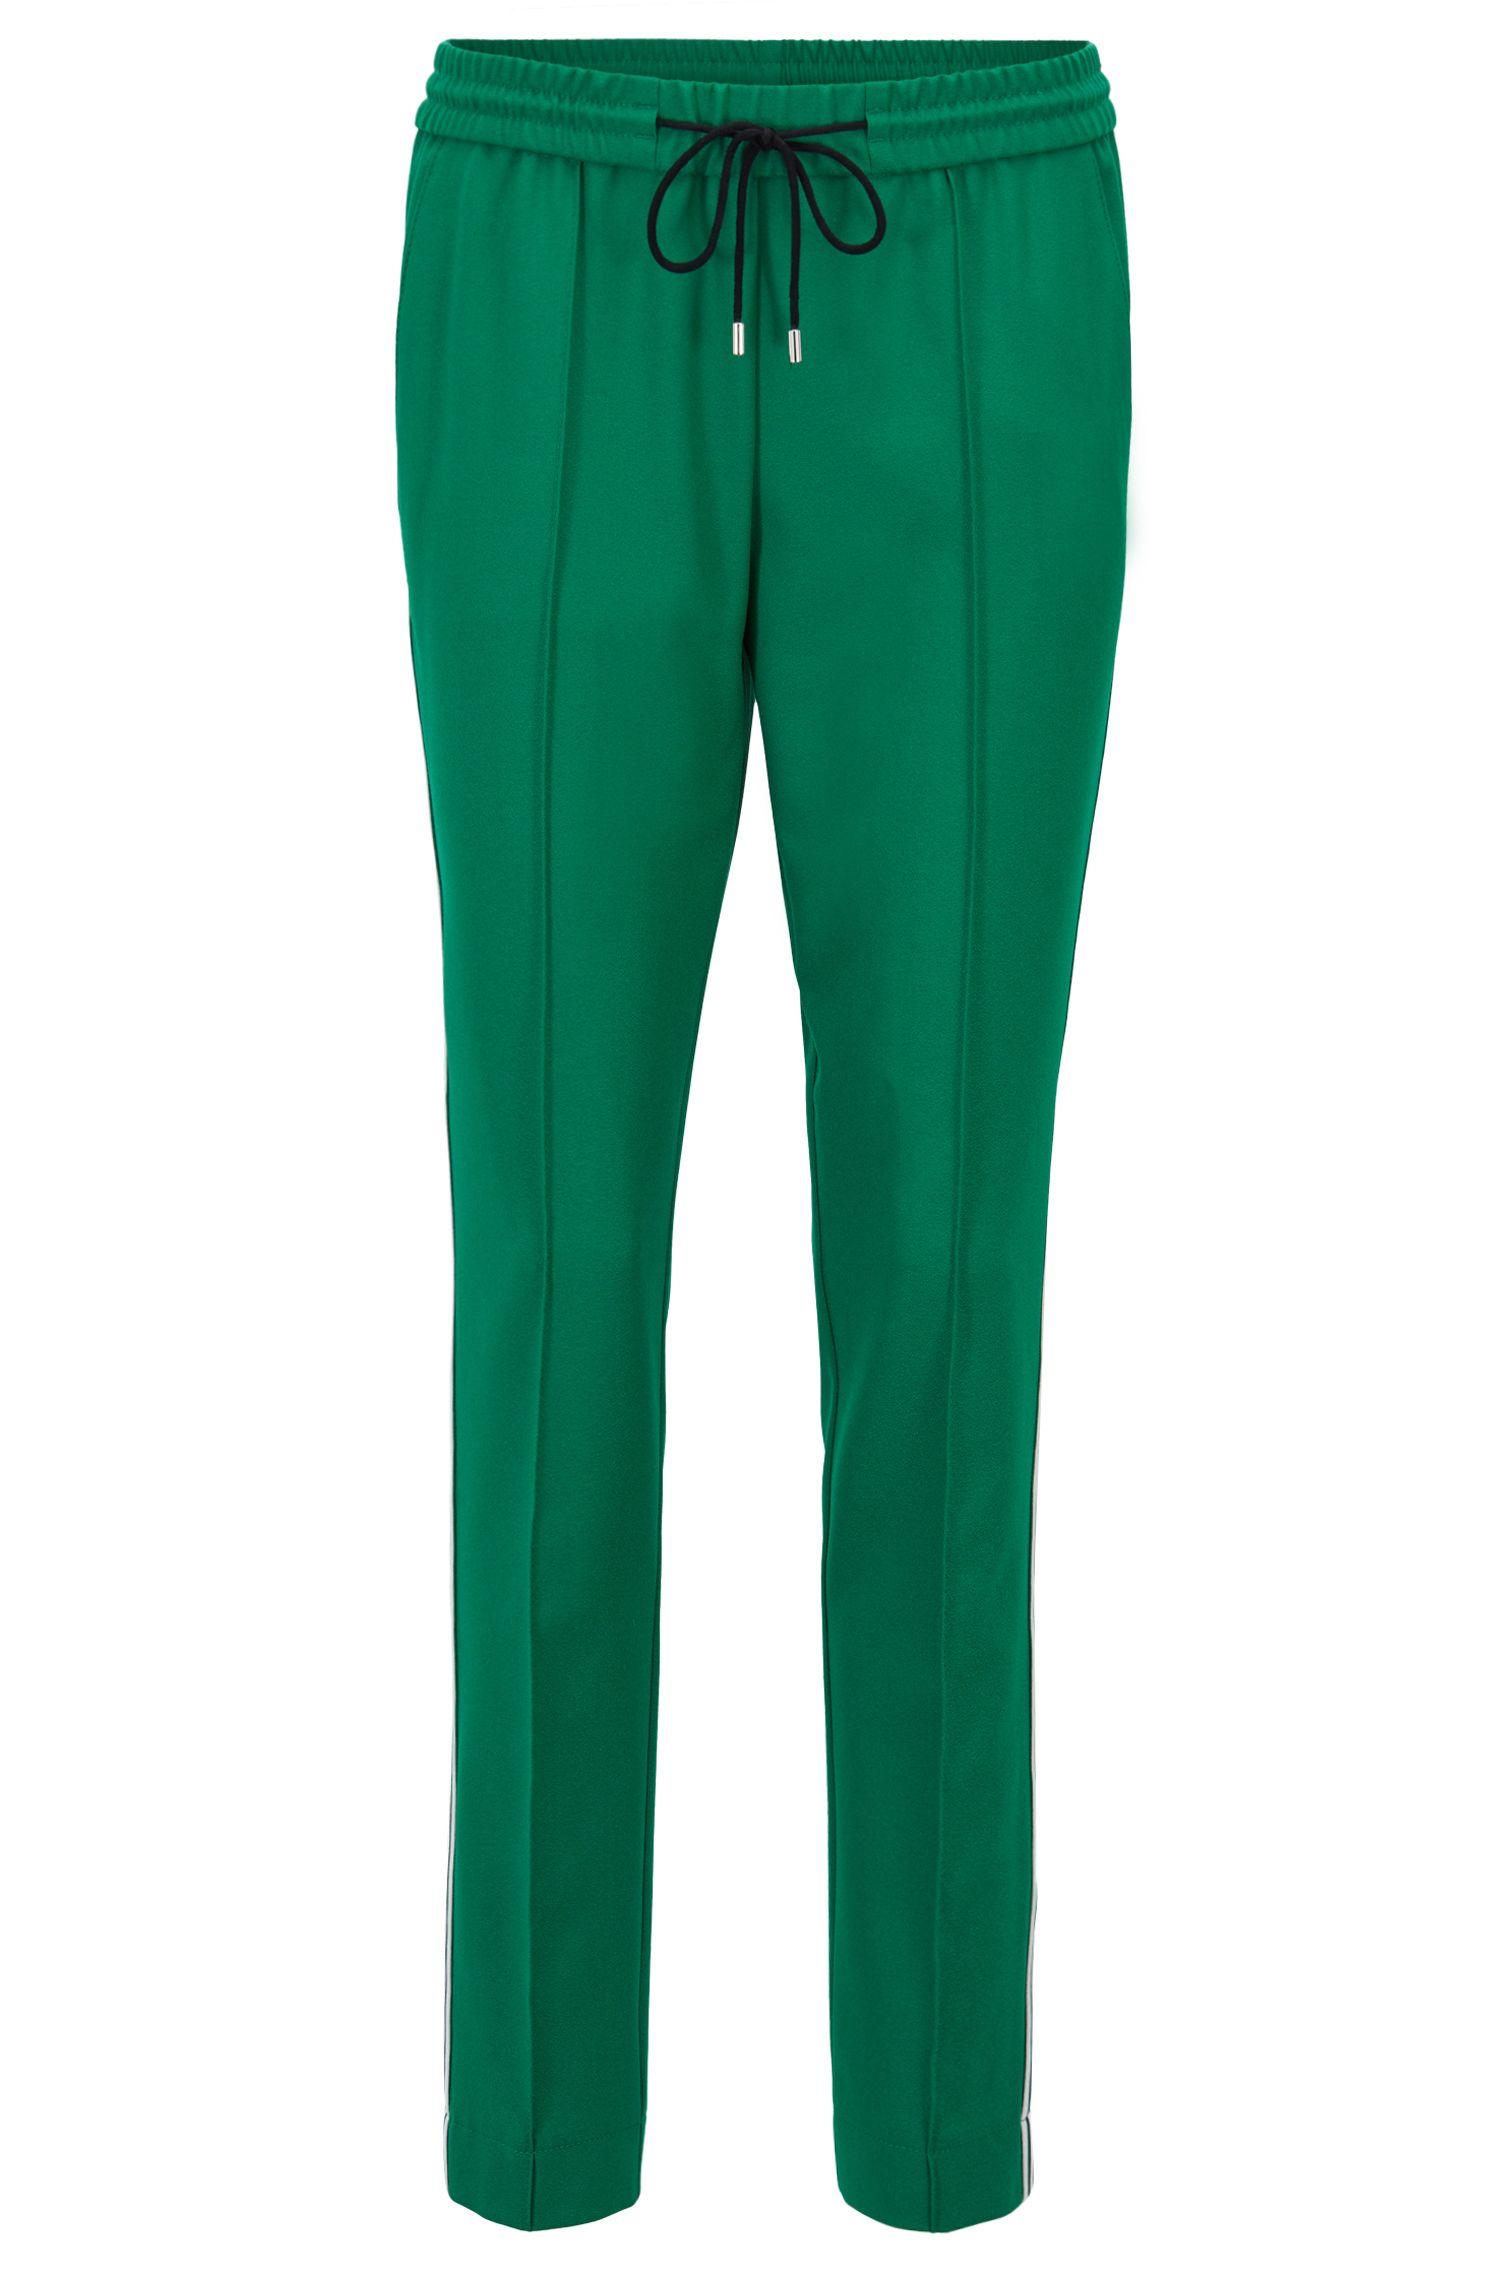 Pantalon Relaxed Fit en crêpe stretch, avec taille à cordon de serrage